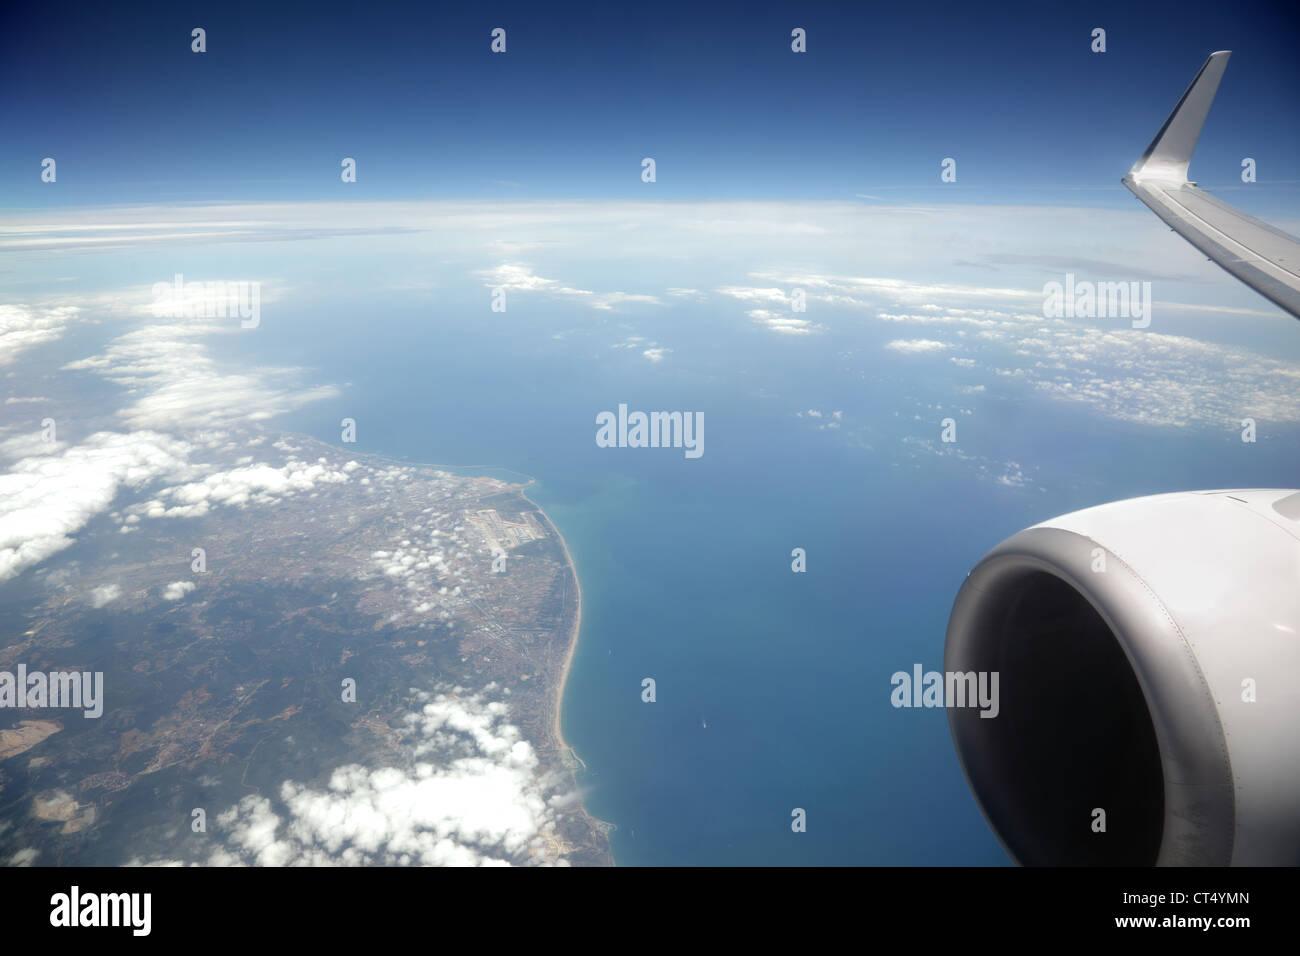 Flugzeugfenster Stockfoto, Bild: 49282037 - Alamy